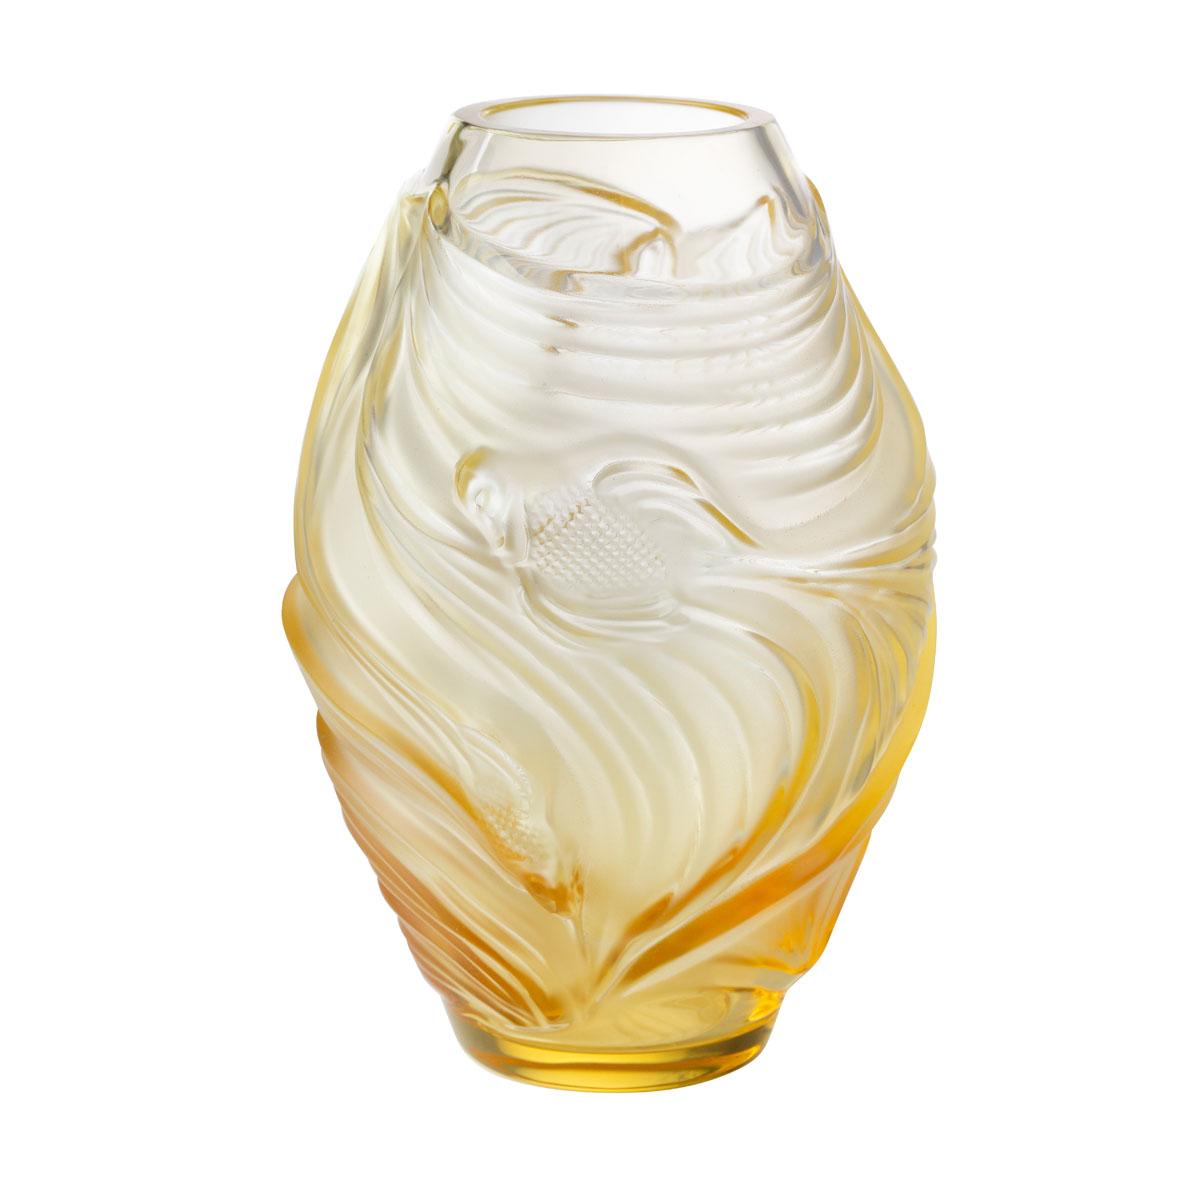 Lalique Poissons Combattants Small Vase, Amber